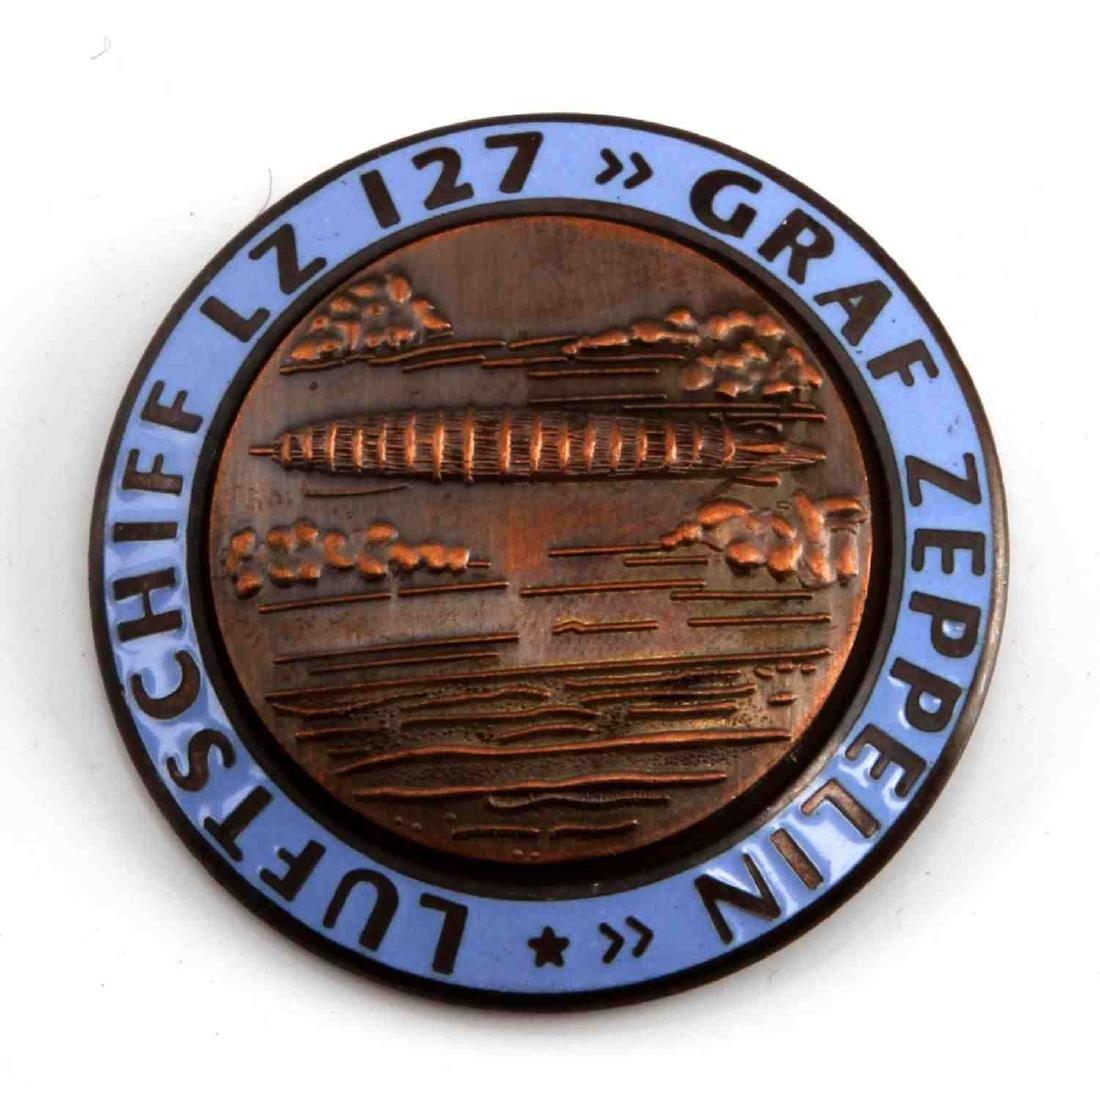 GERMAN WWII GRAF ZEPPELIN LZ 127 AIR SHIP BADGE